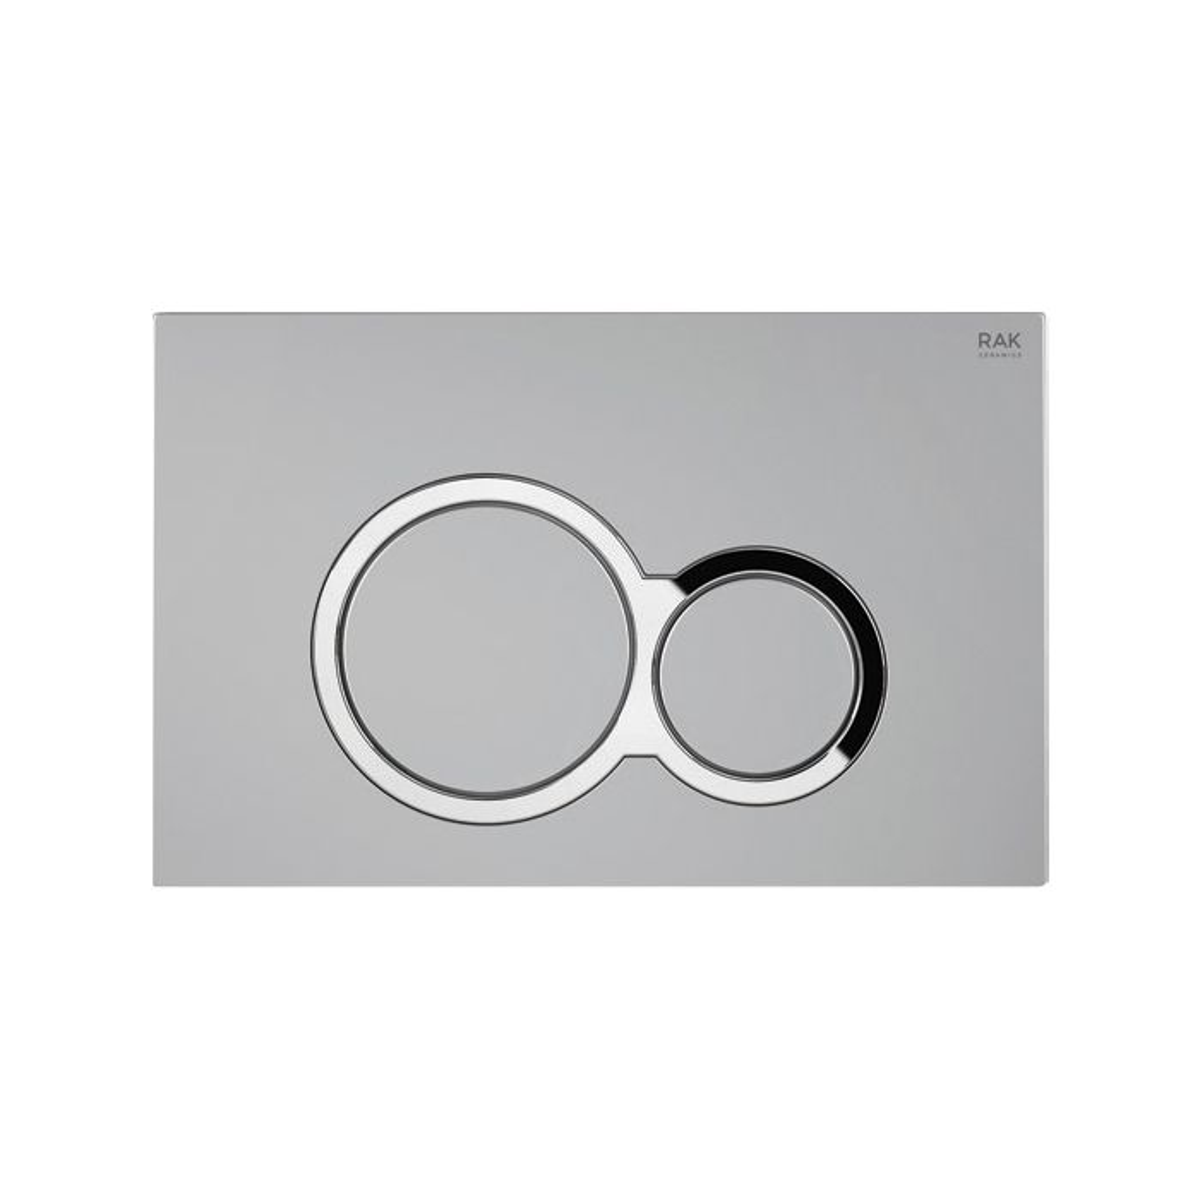 RAK Ecofix Matt Chrome Flush Plate with Surrounded Round Push Buttons